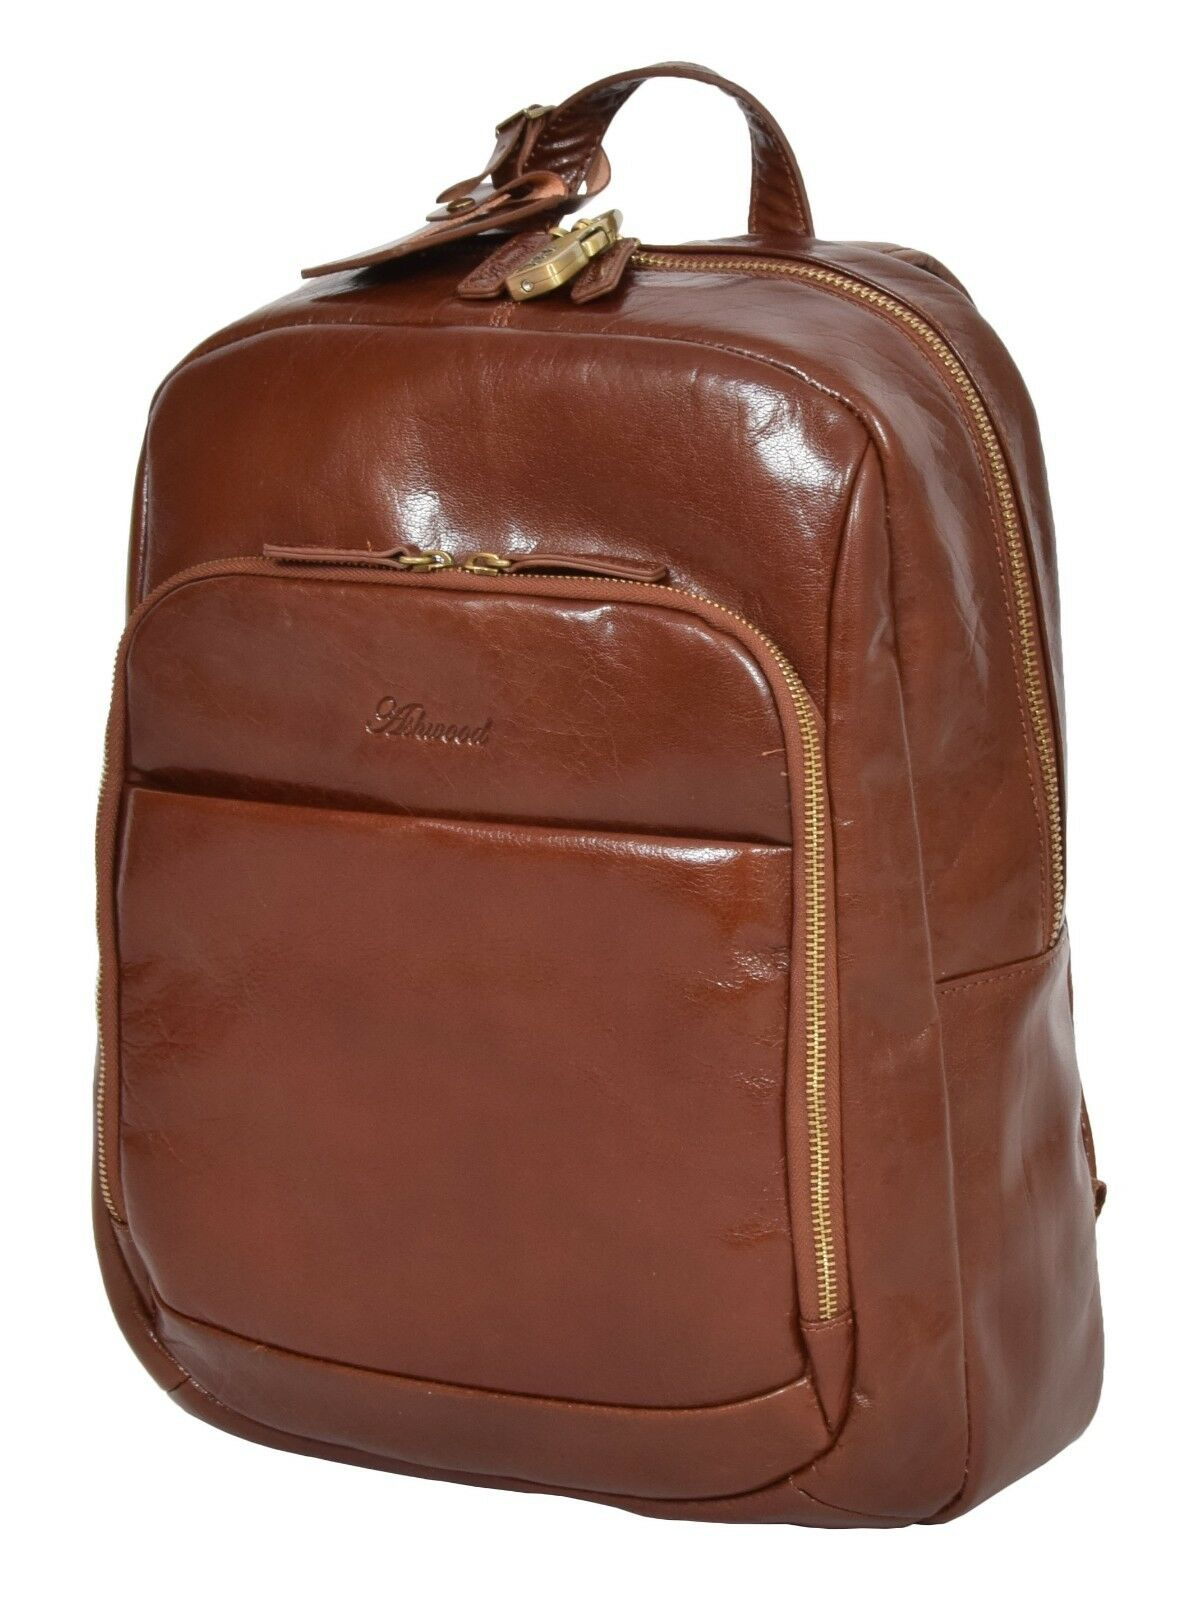 dbfc60efa Womens Real Leather Backpack Lightweight Travel Rucksack Peru Chestnut Tan  for sale online   eBay